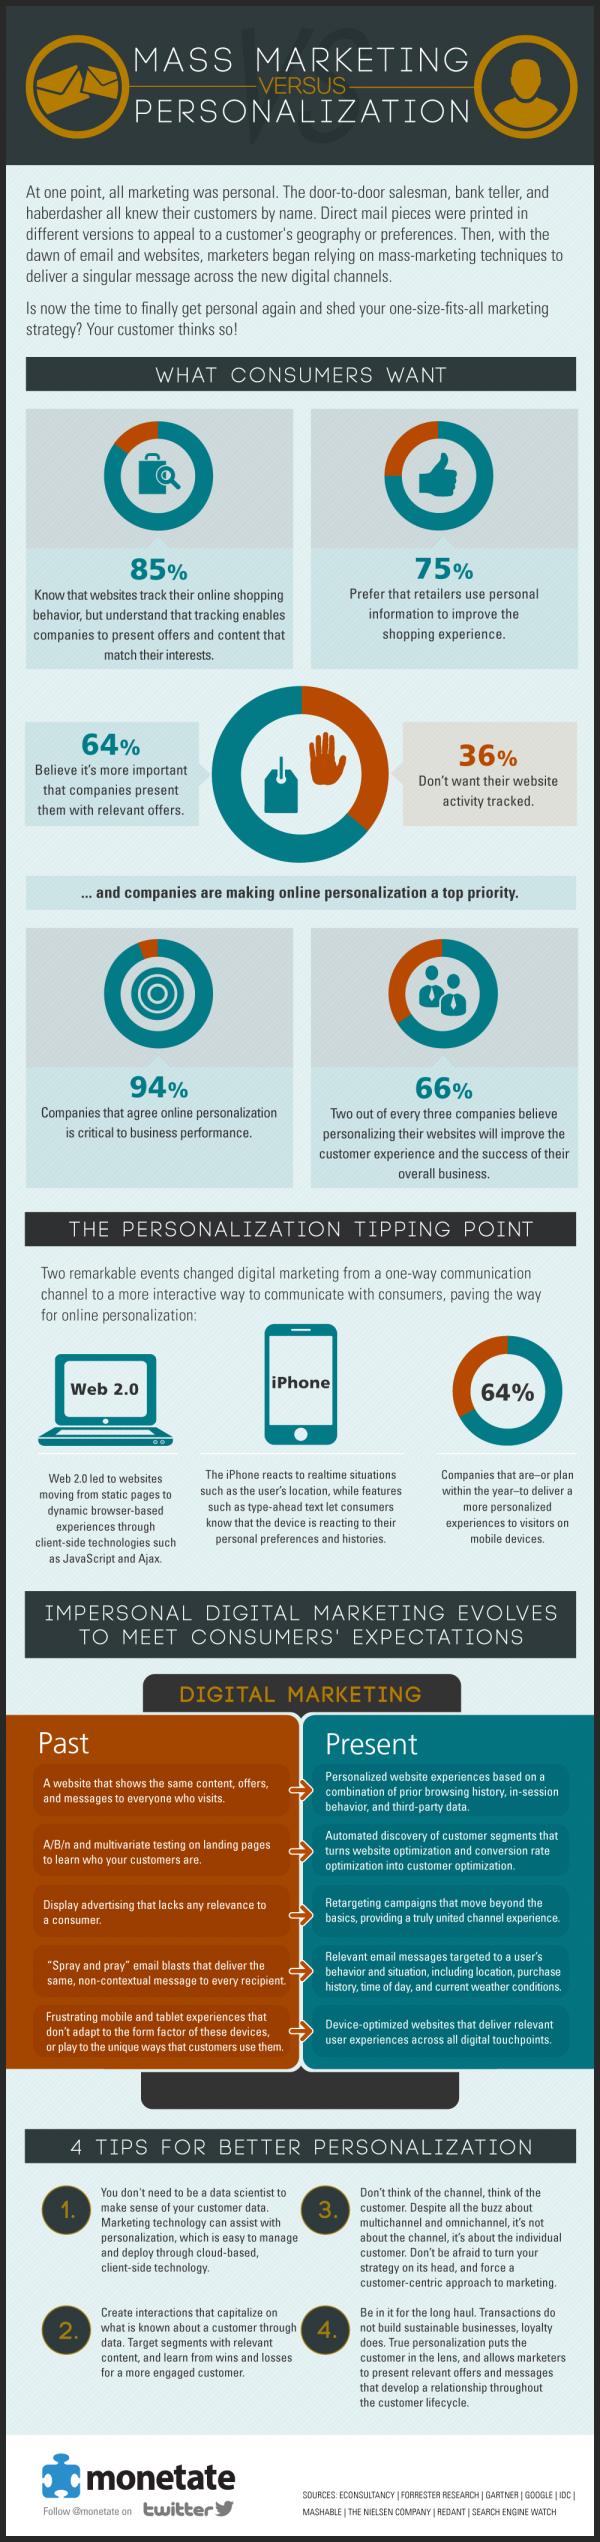 Personalization of internet marketing